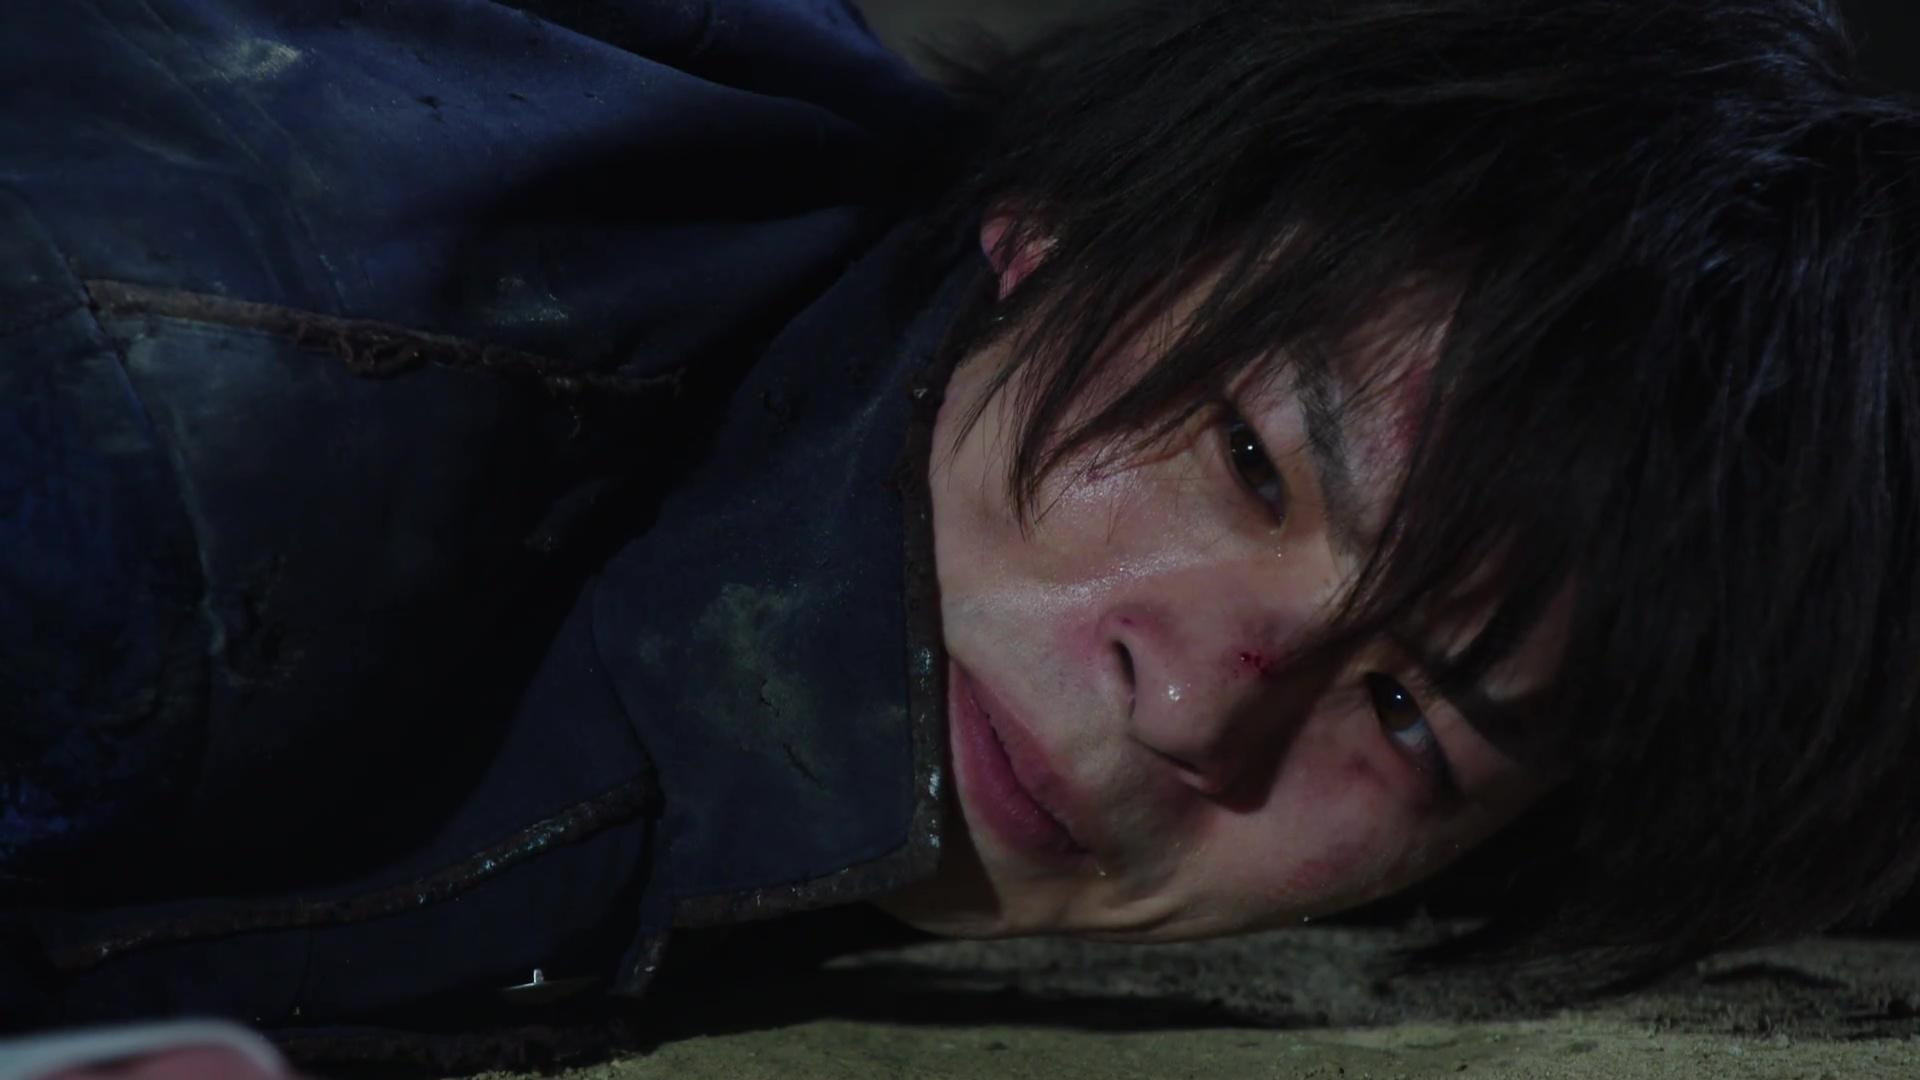 Kamen Rider Saber Episode 47 Recap Season Wrap-Up Review